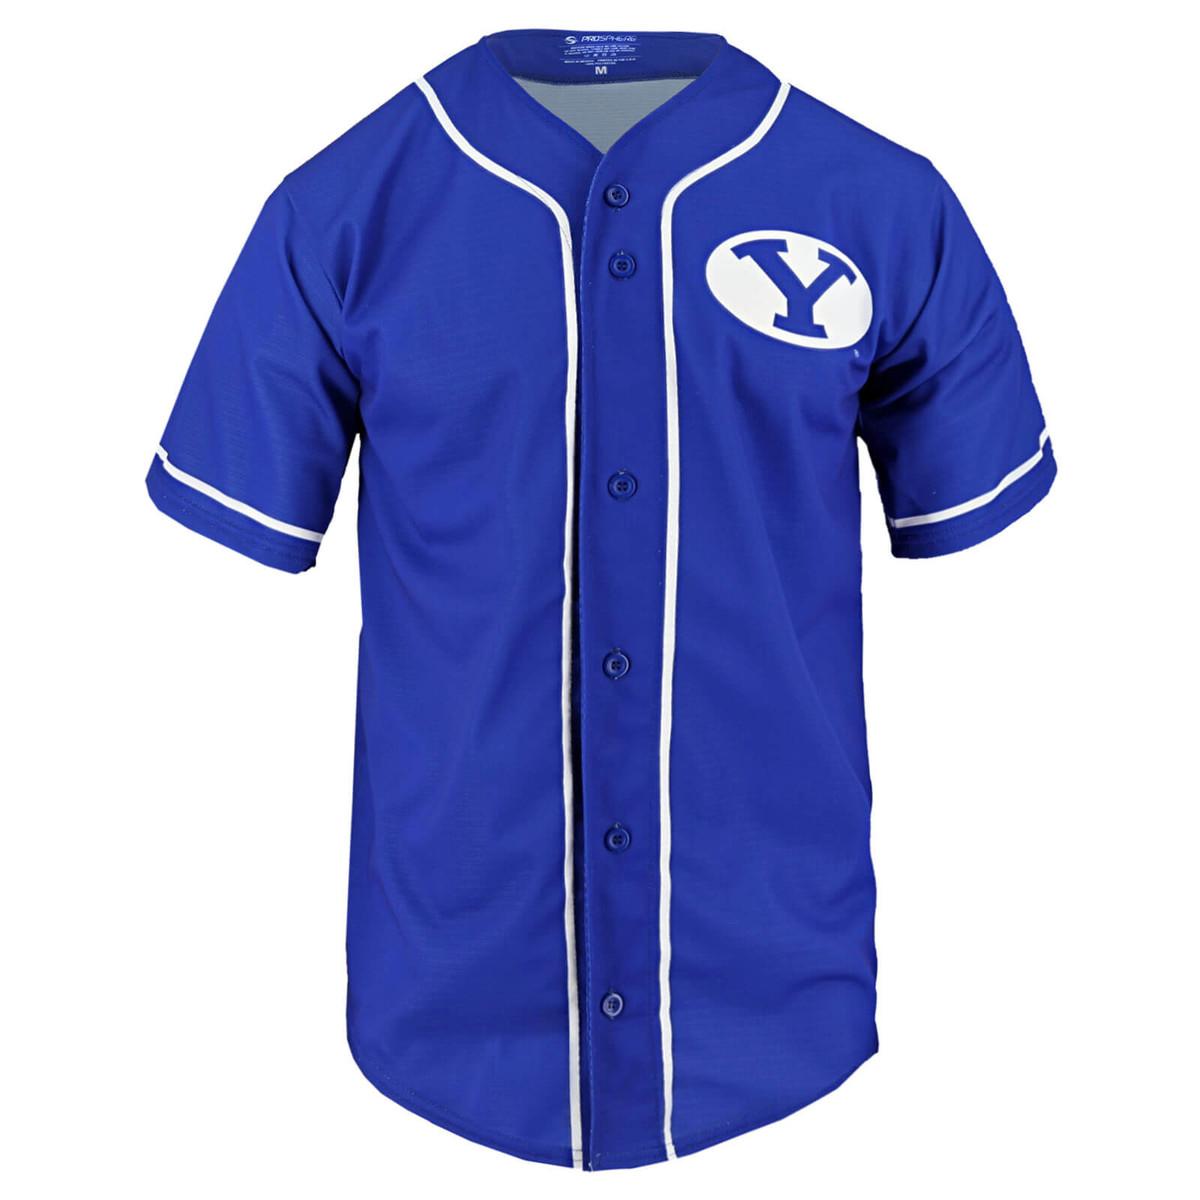 size 40 60db2 8b1a9 Oval Y BYU Baseball Jersey - Prosphere